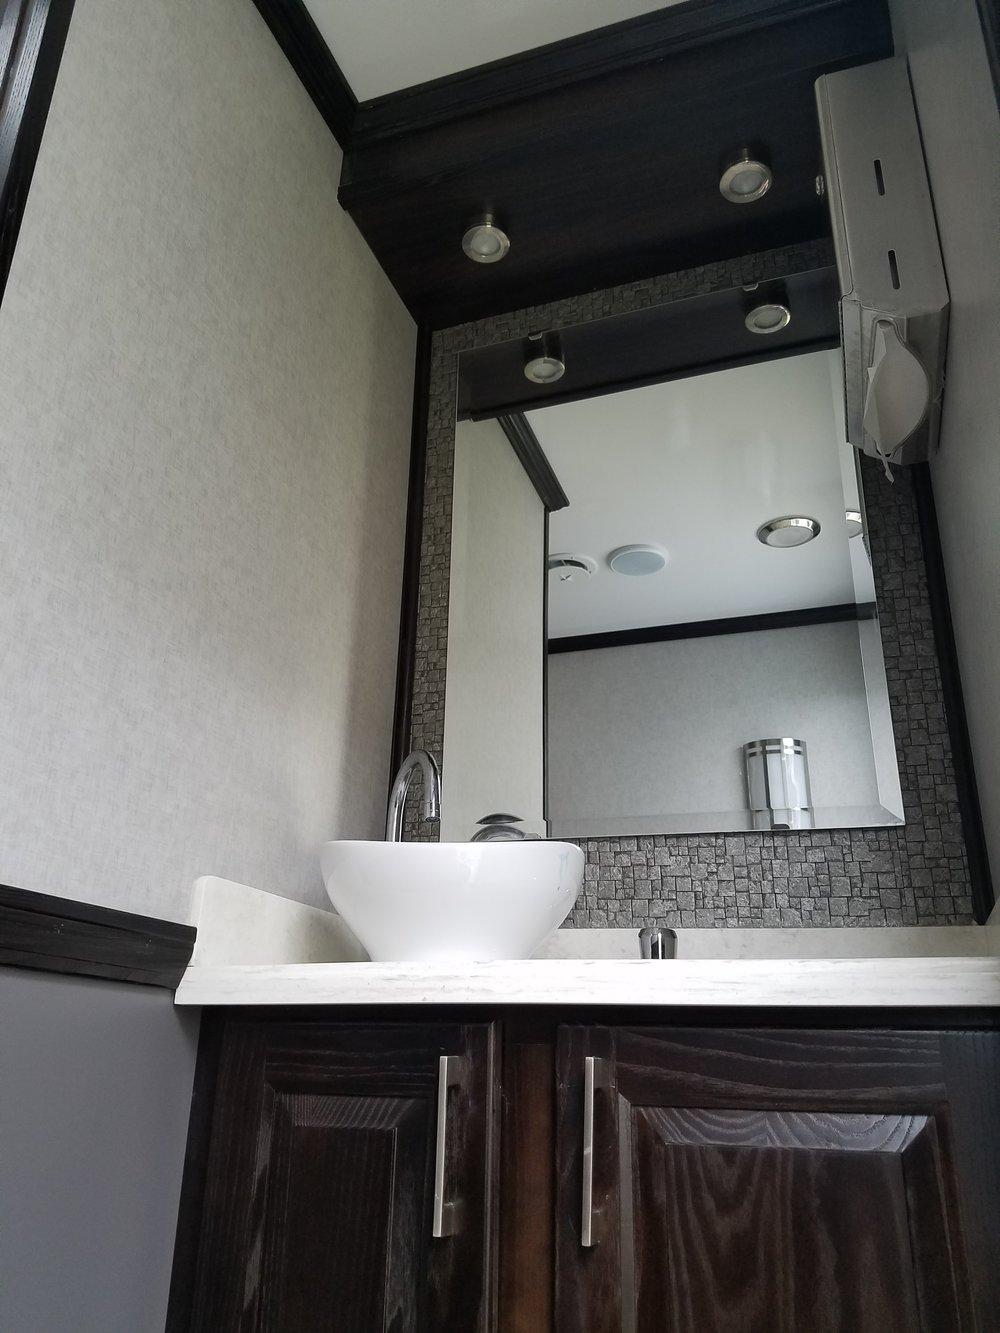 Portable Restroom.jpg